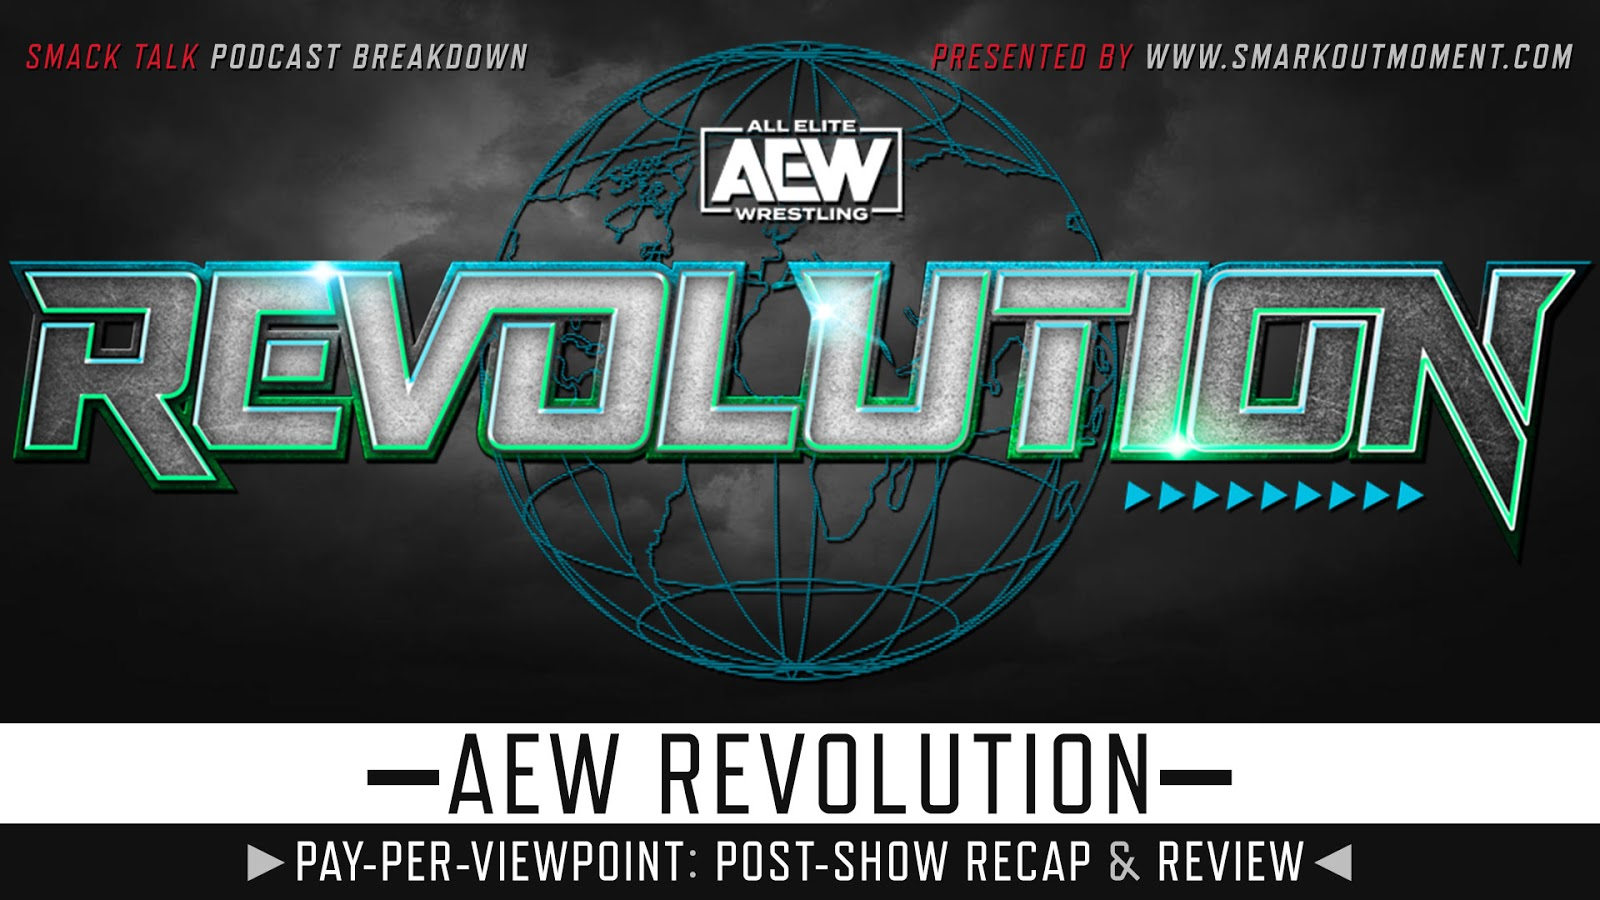 AEW Revolution 2020 Recap and Review Podcast